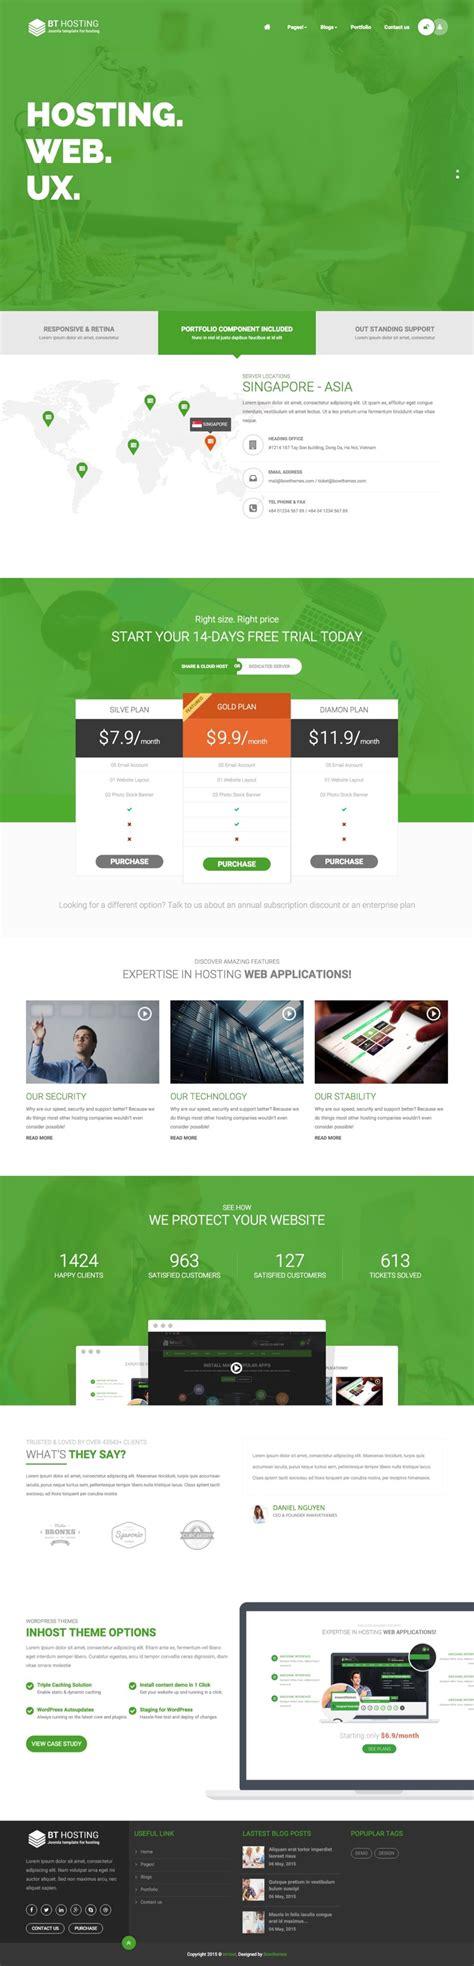 joomla hosting templates bt hosting joomla template for web host business service